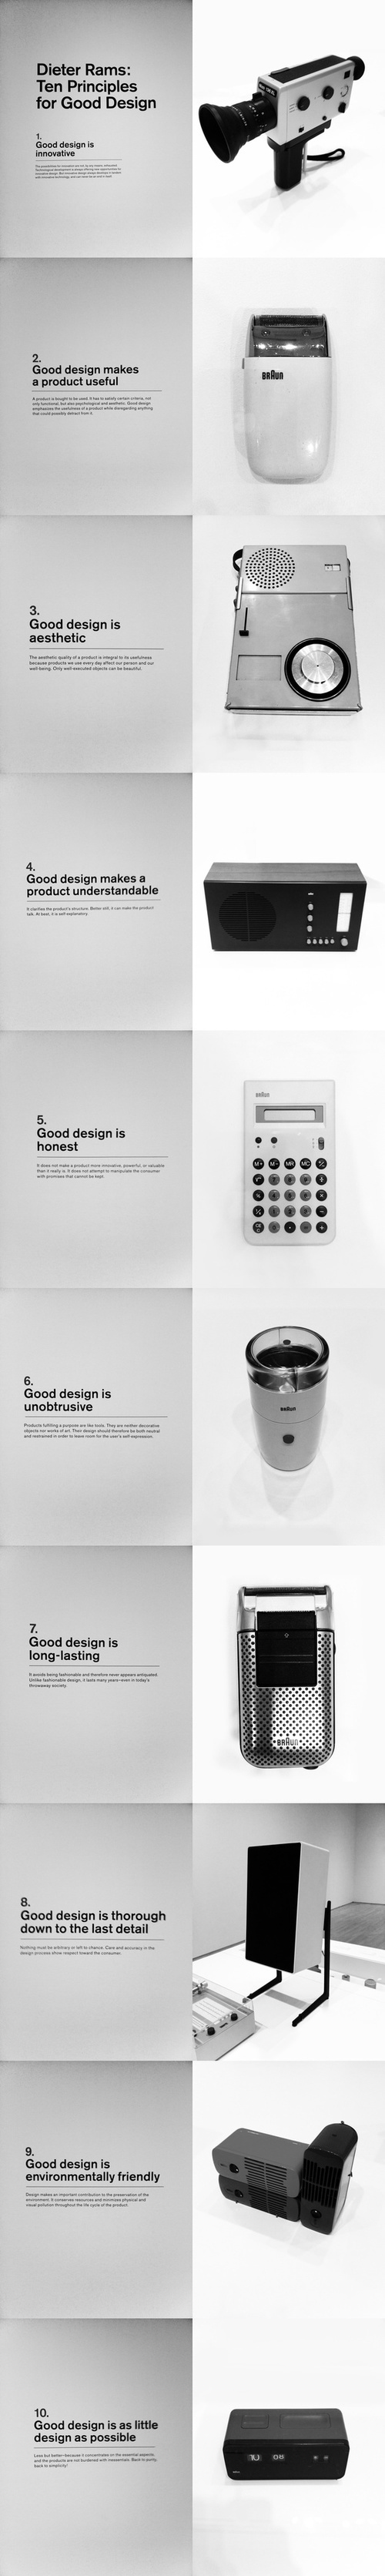 10 principles for good design.jpg